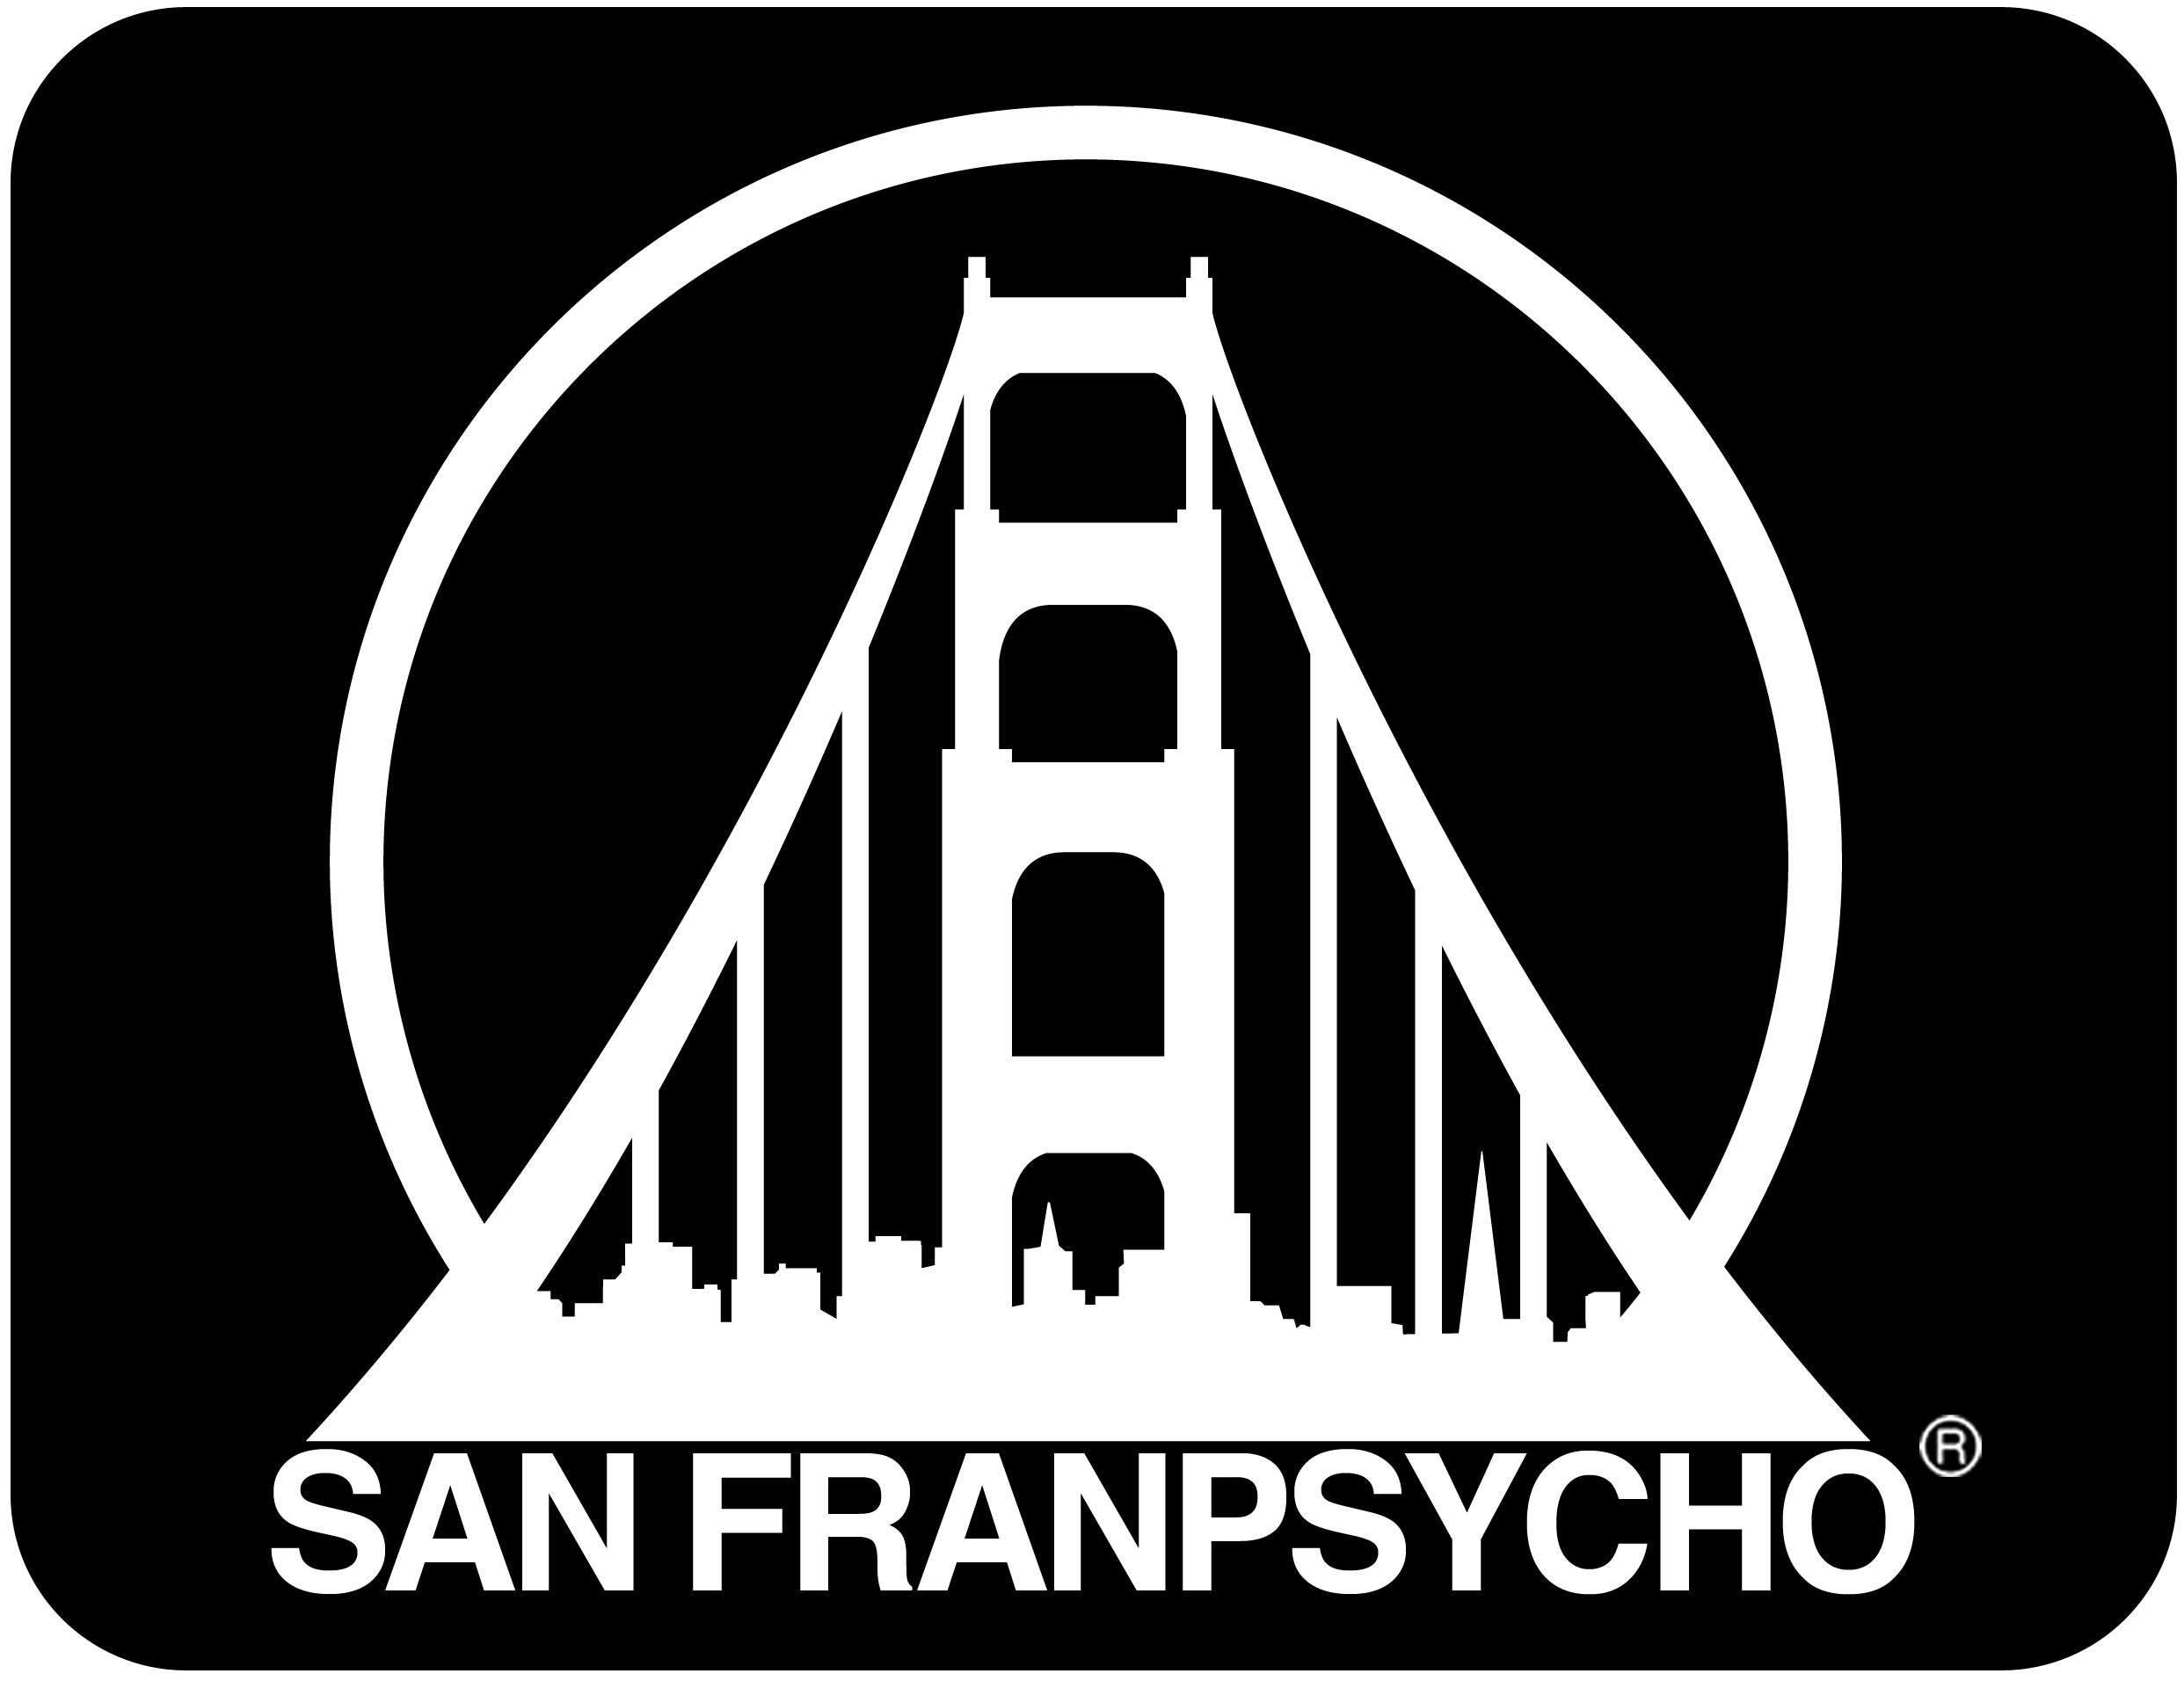 sanfranpsycho